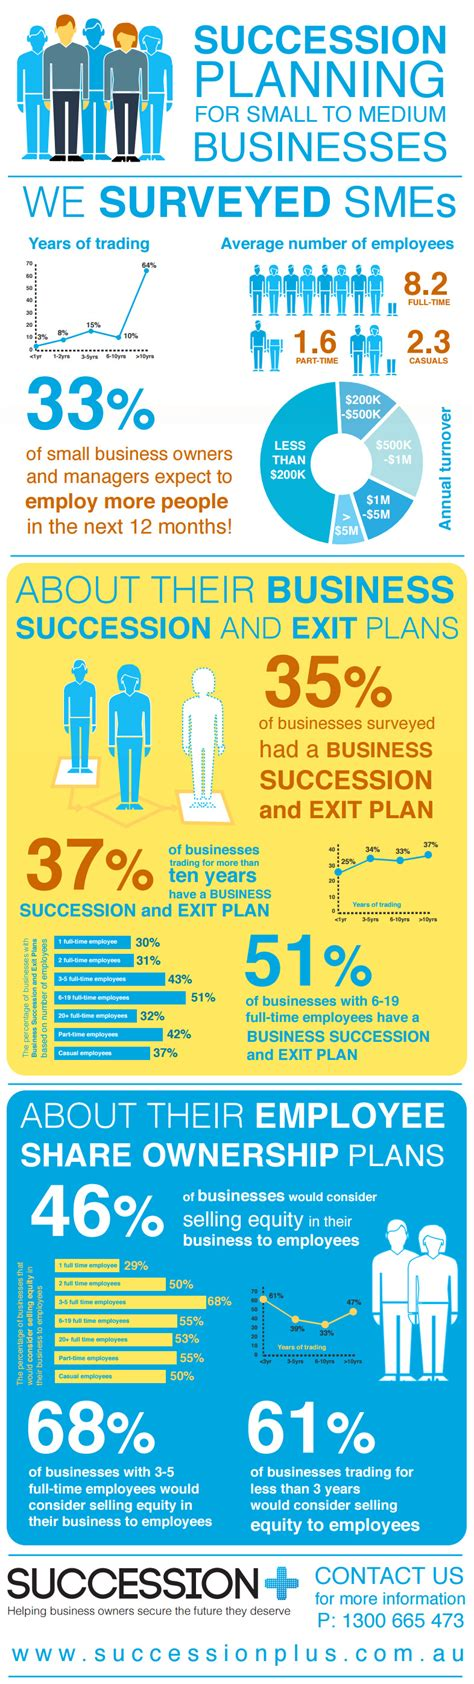 Best Small Home Plans Succession Planning Infographic Succession Plus Australia